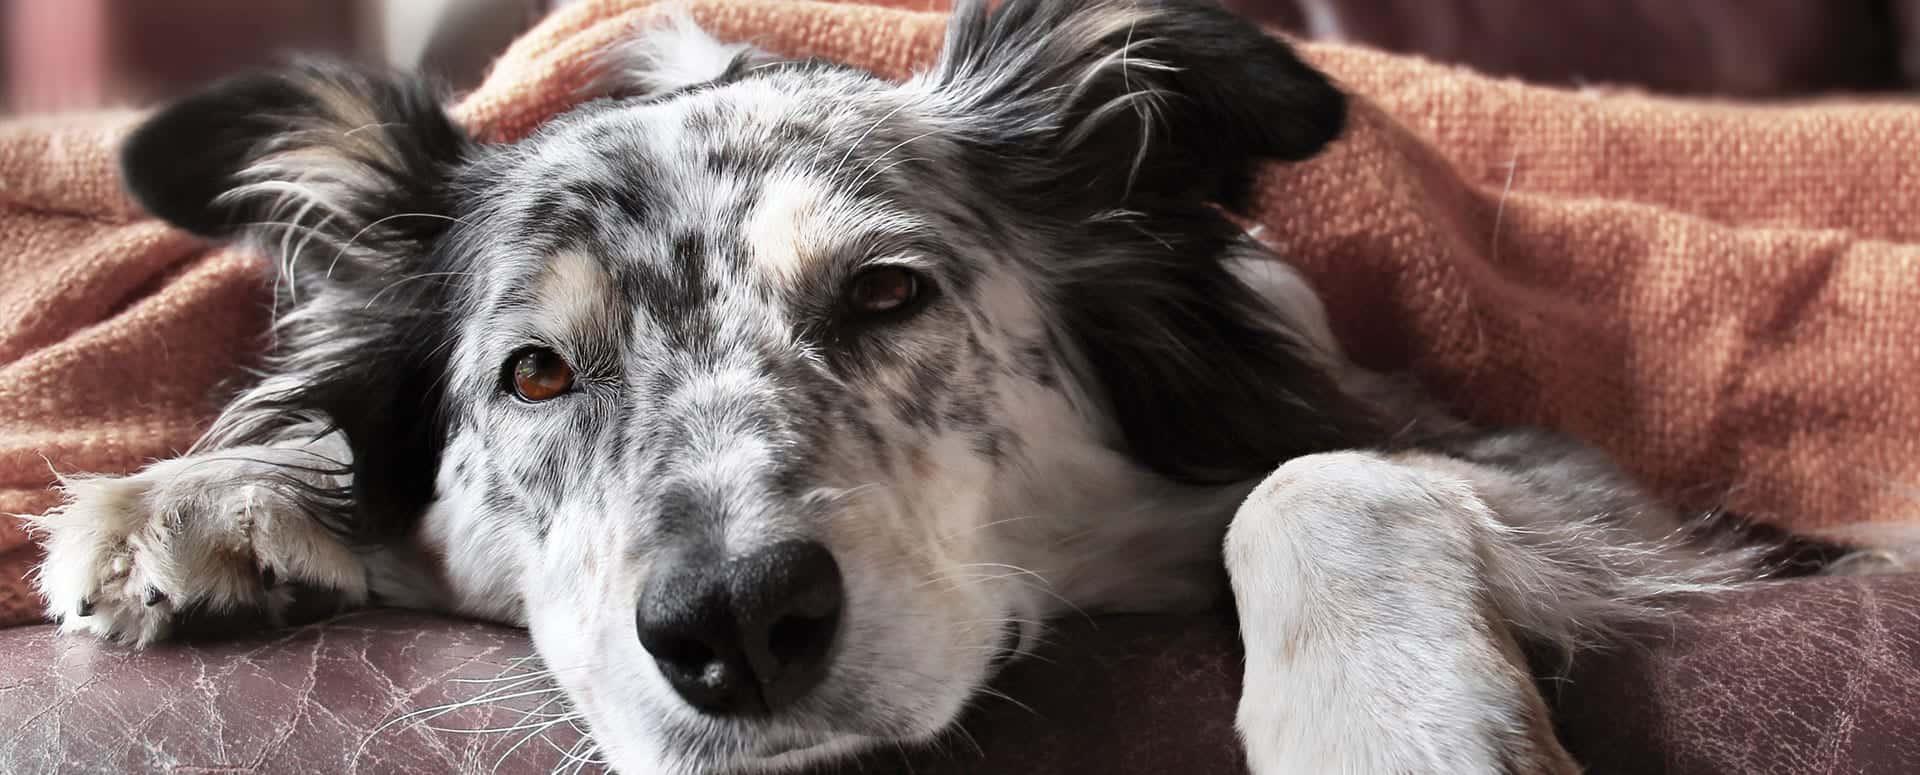 Pet Friendly Cabin Rentals in Gatlinburg TN